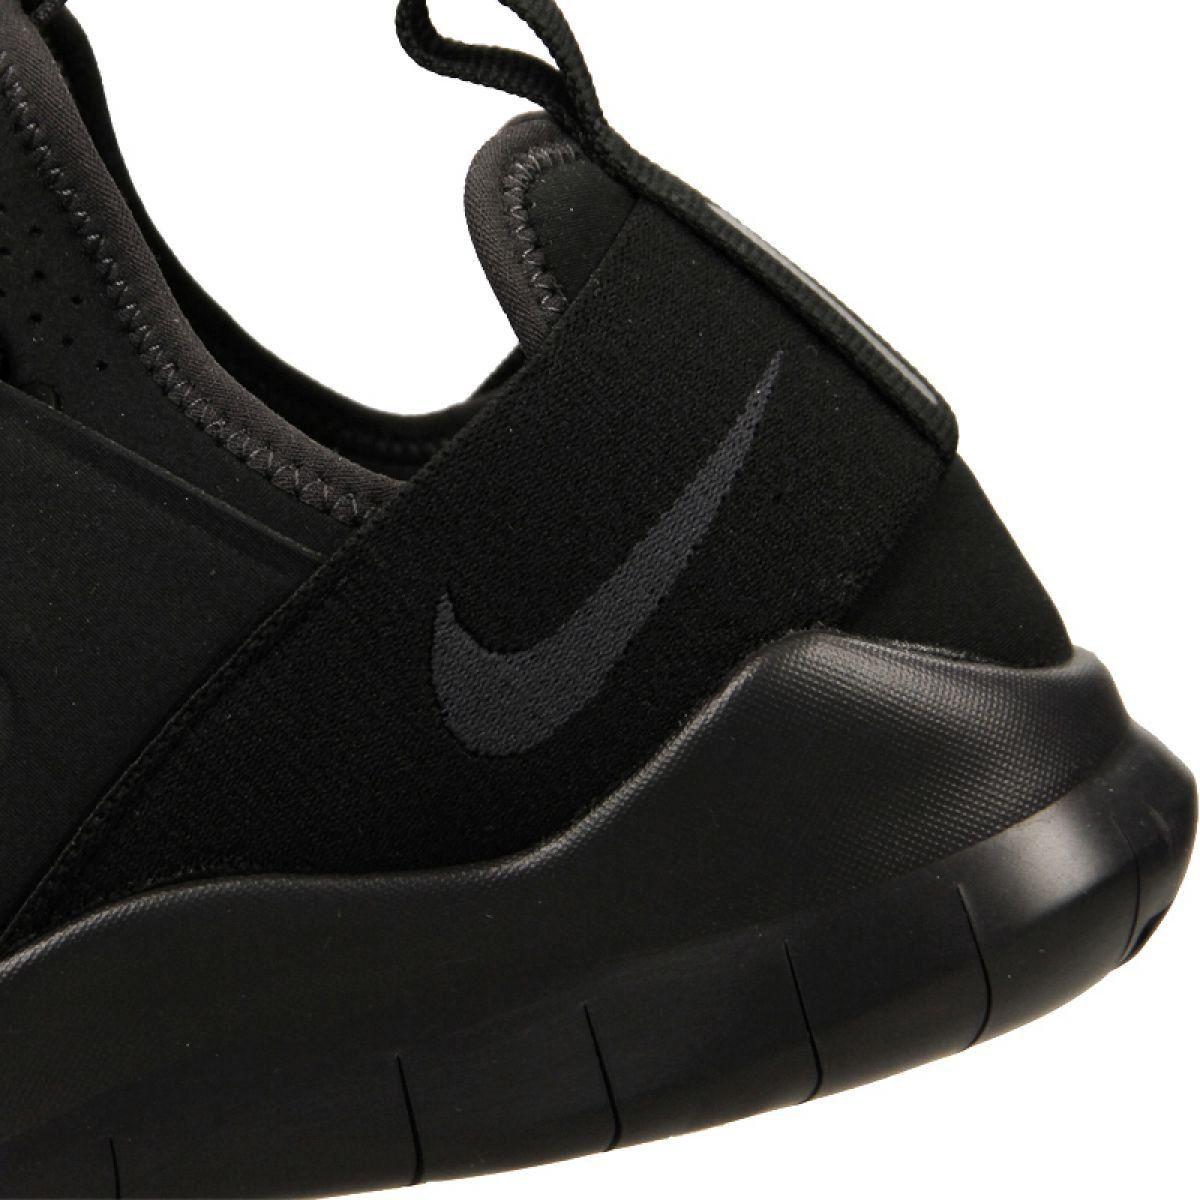 Sports Men S Nike Nike Free Rn Cmtr 2018 M Aa1620 002 Shoes Black Black Shoes Mens Nike Shoes Nike Free